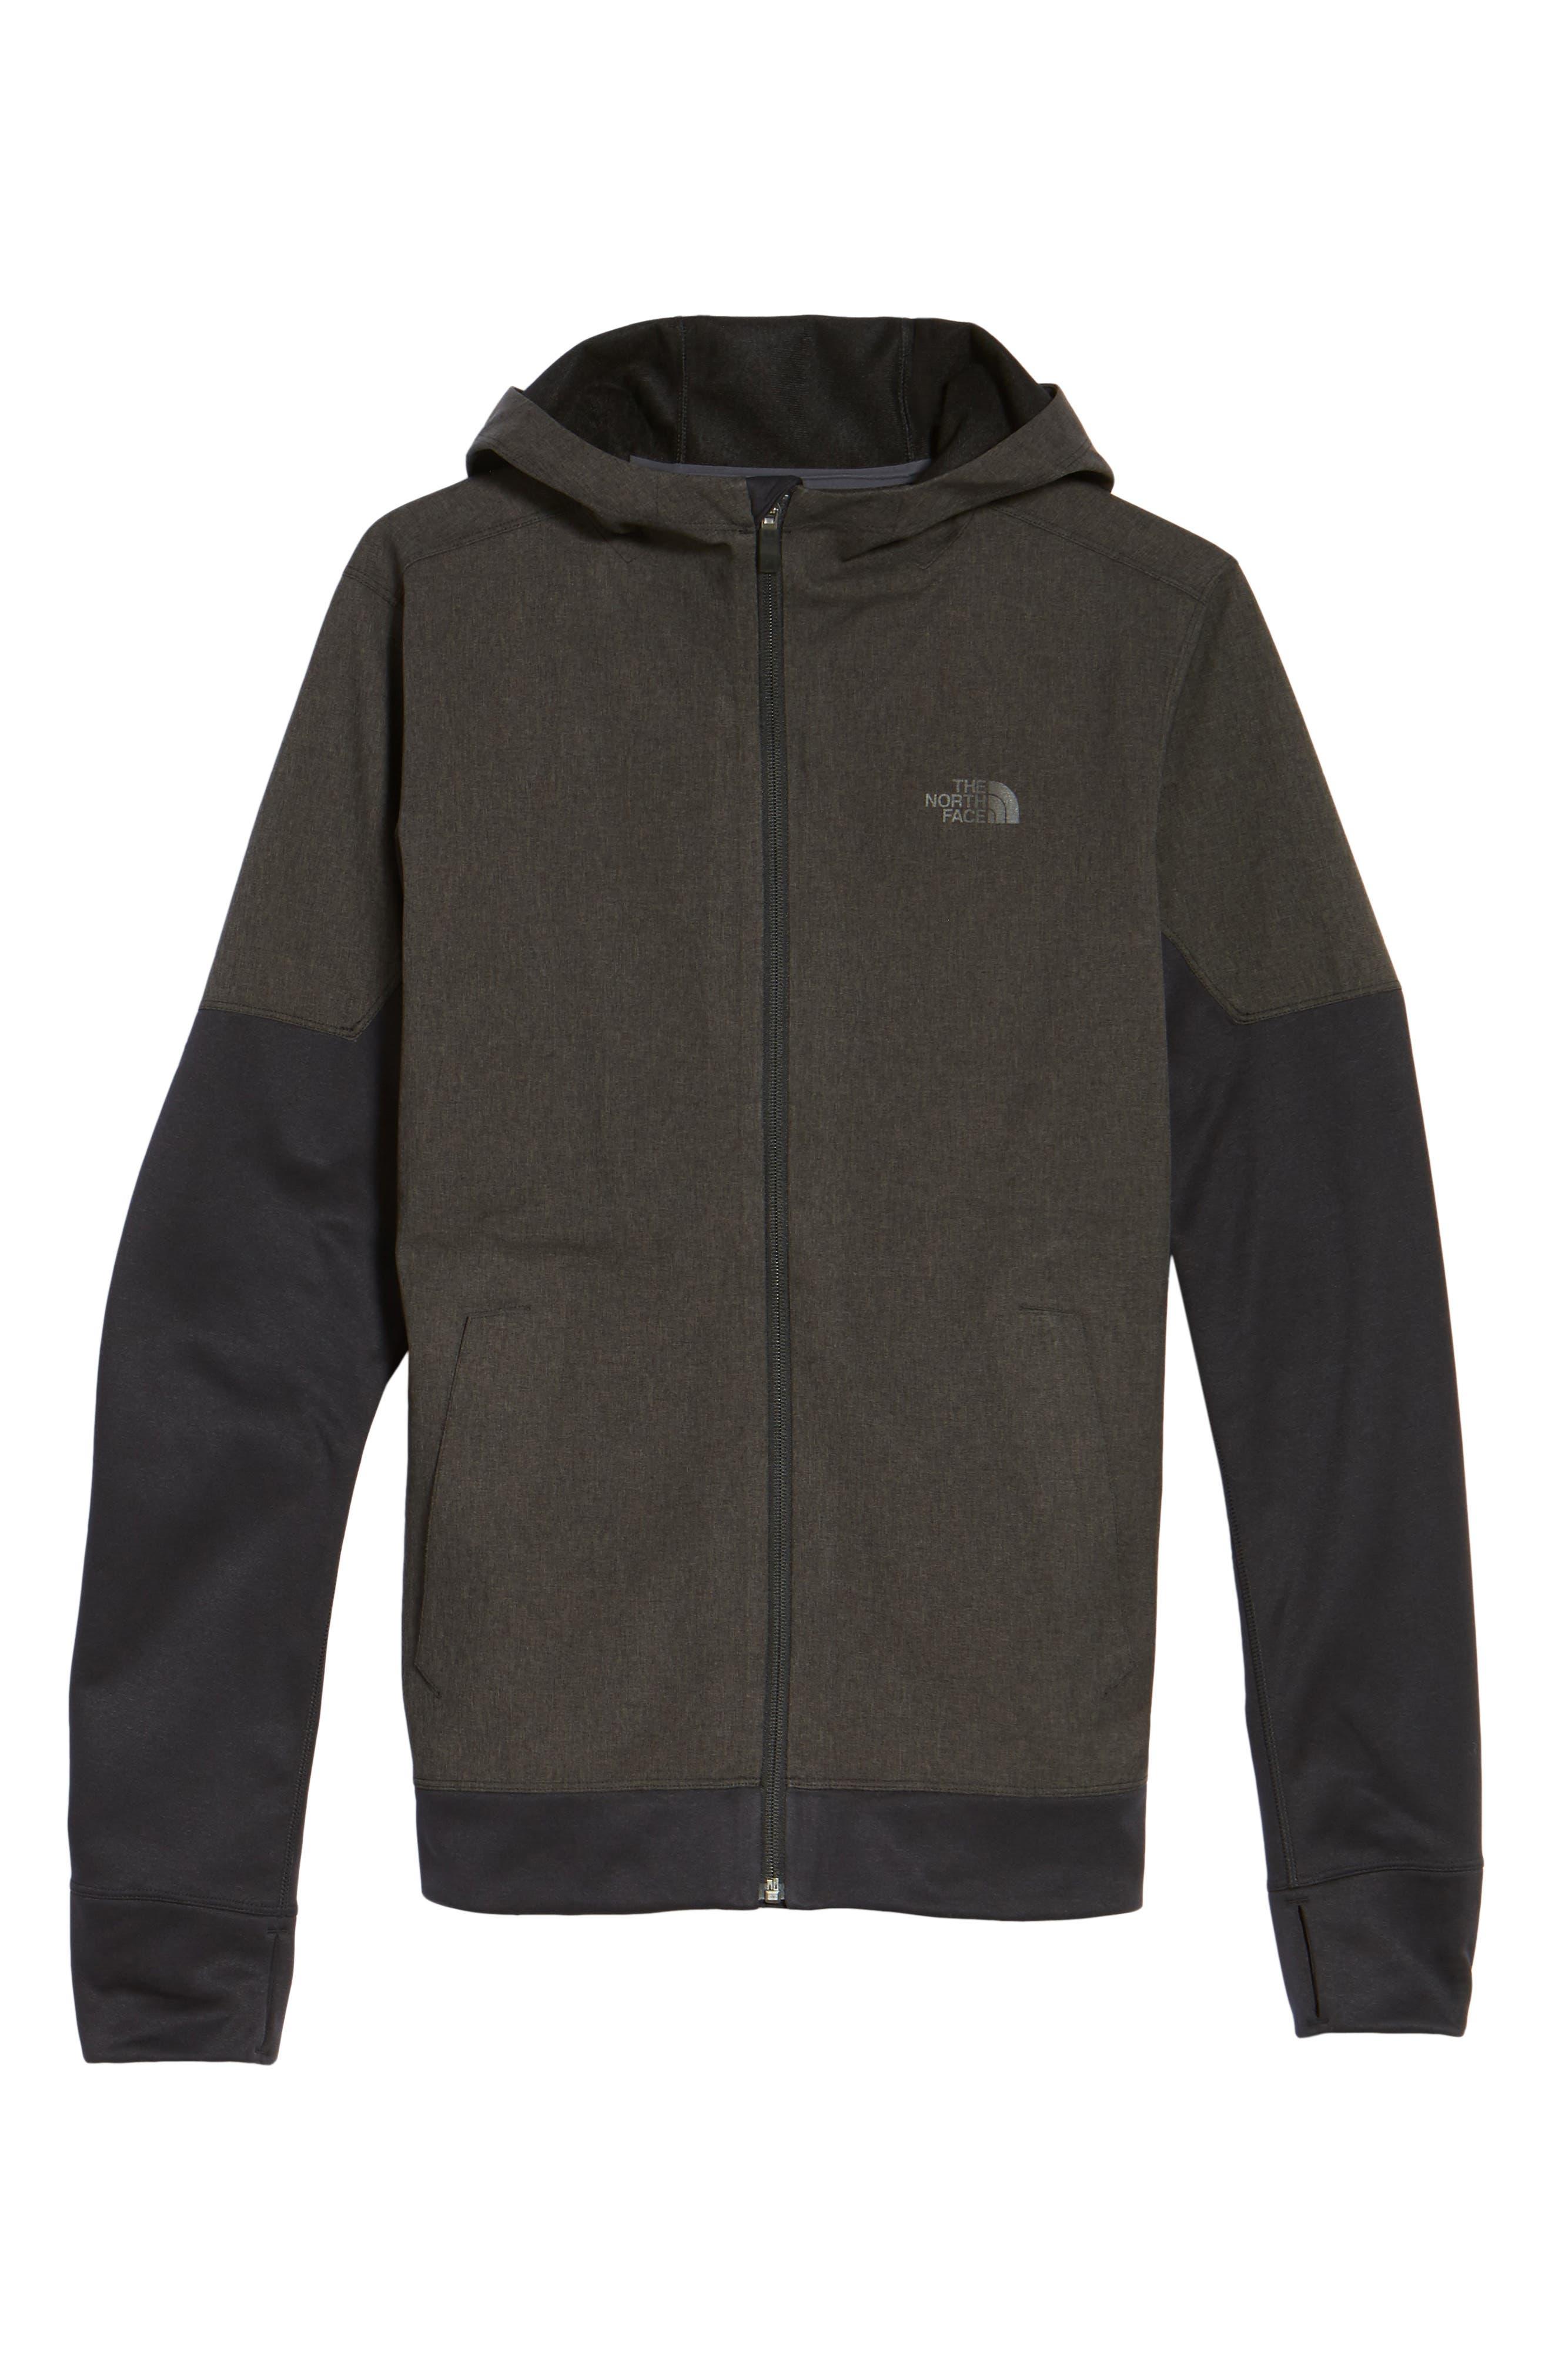 'Kilowatt' Hooded Jacket,                             Alternate thumbnail 5, color,                             001